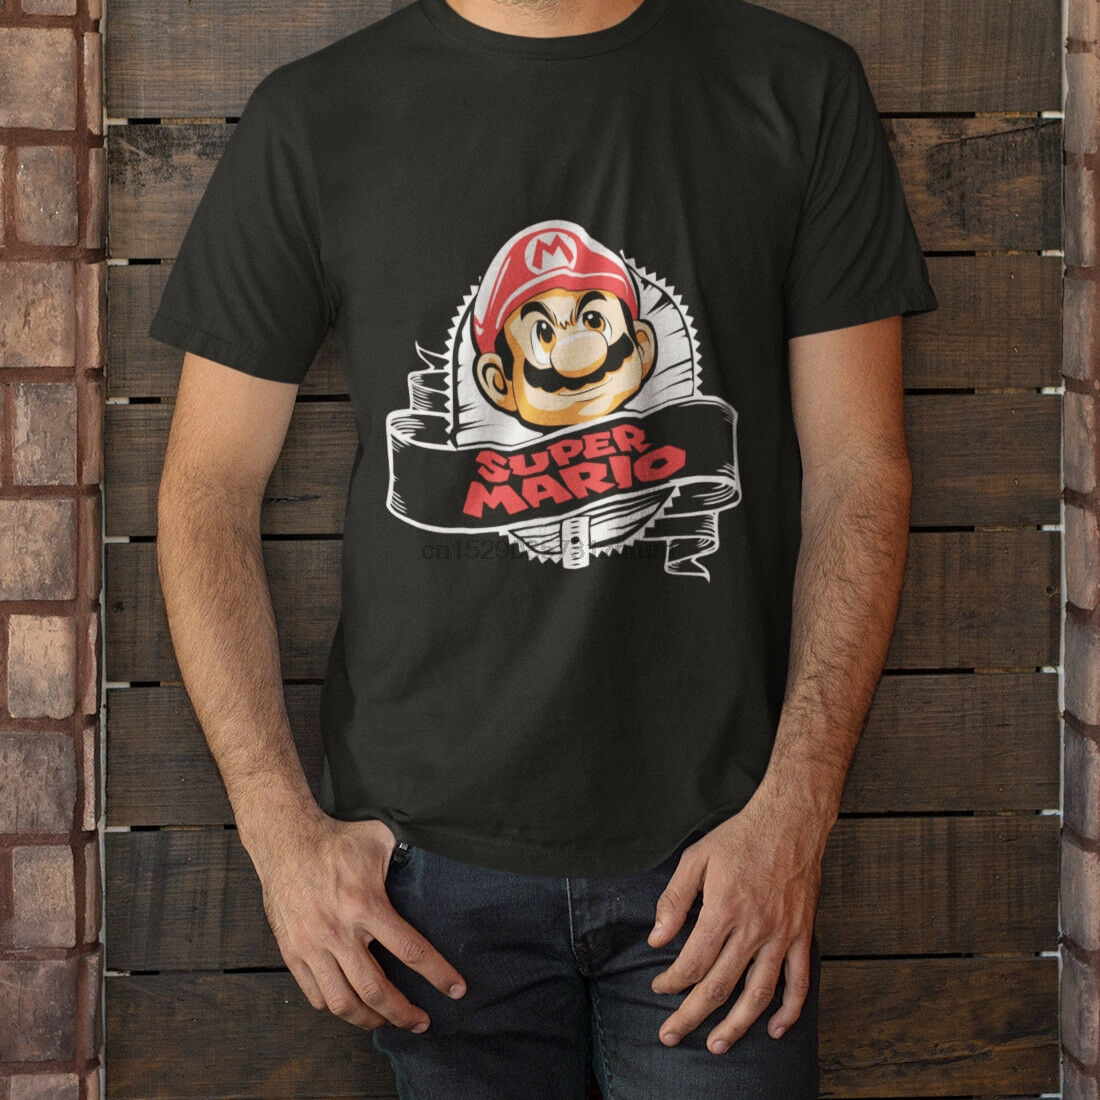 New Super Mario Bros Short Sleeve Black Men/'s T-Shirt Size S-5XL